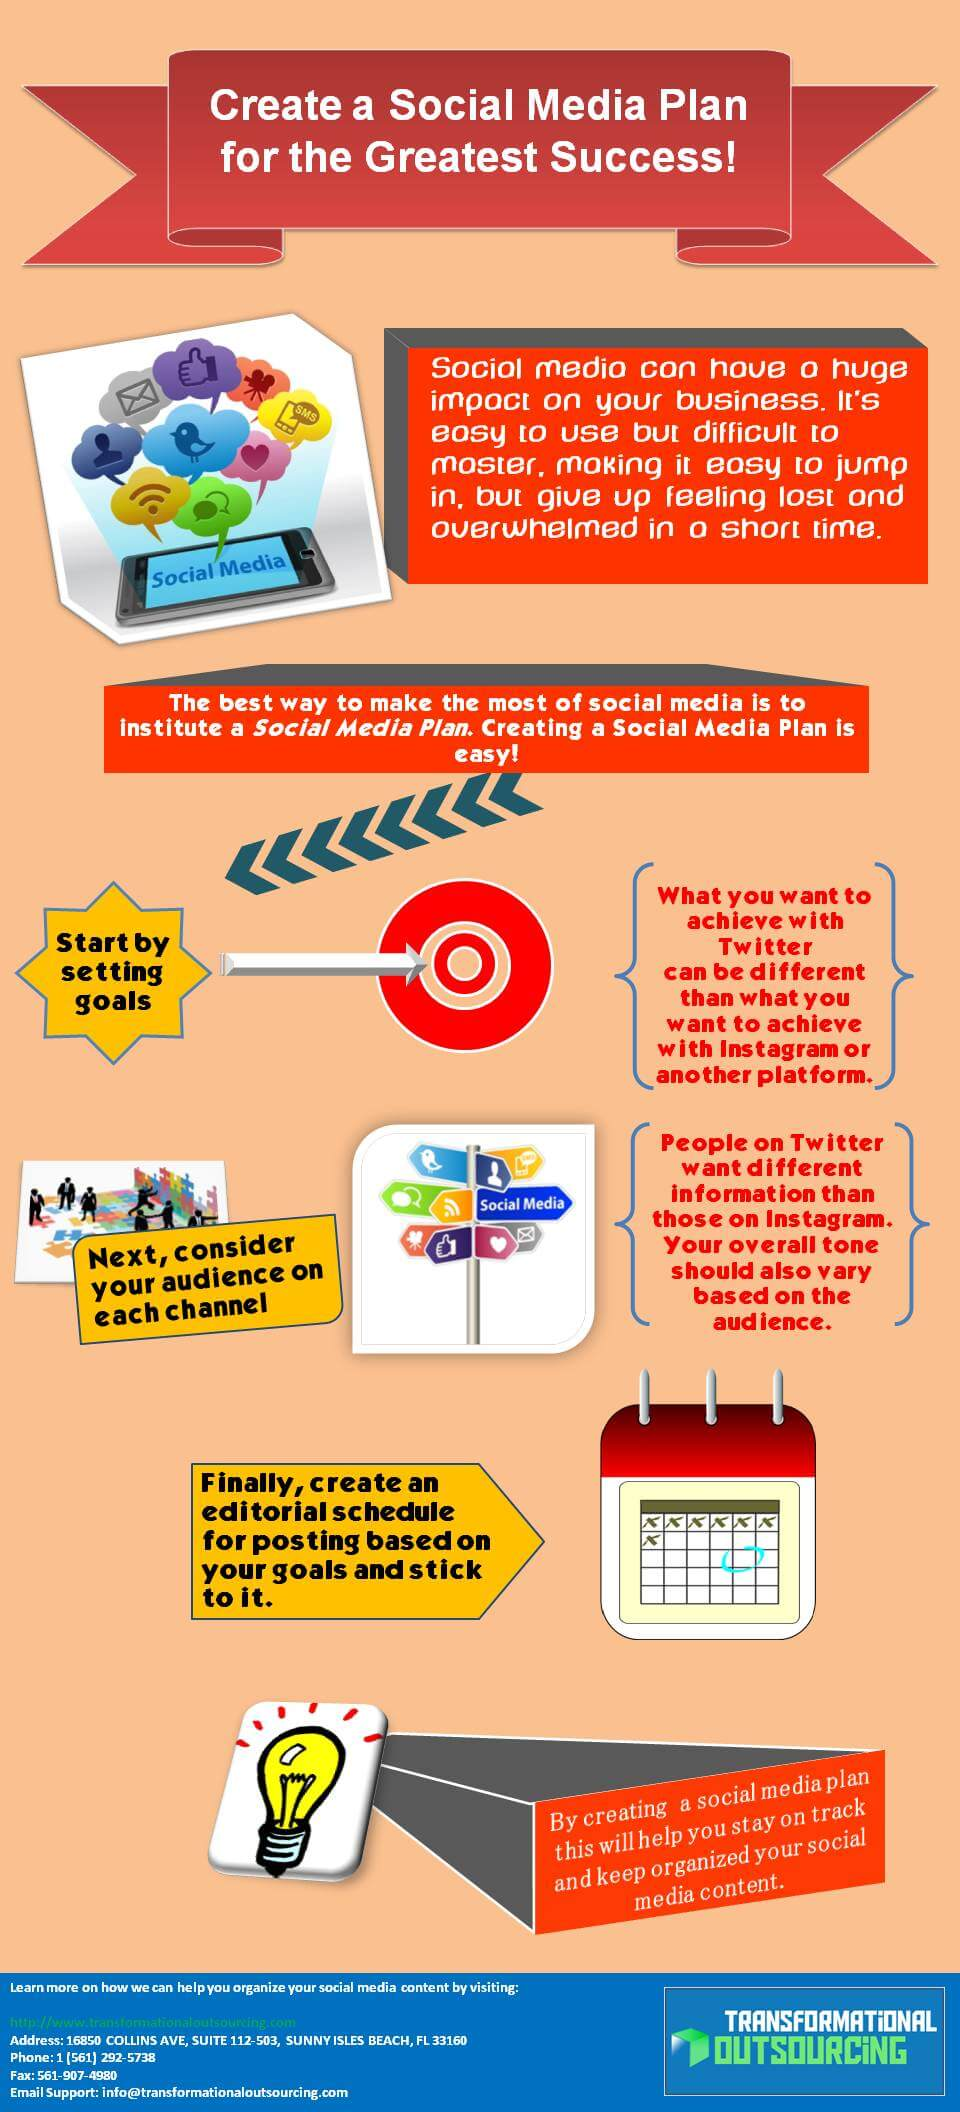 TOI_Infographics_Create a Social Media Plan_Oct2015_Final